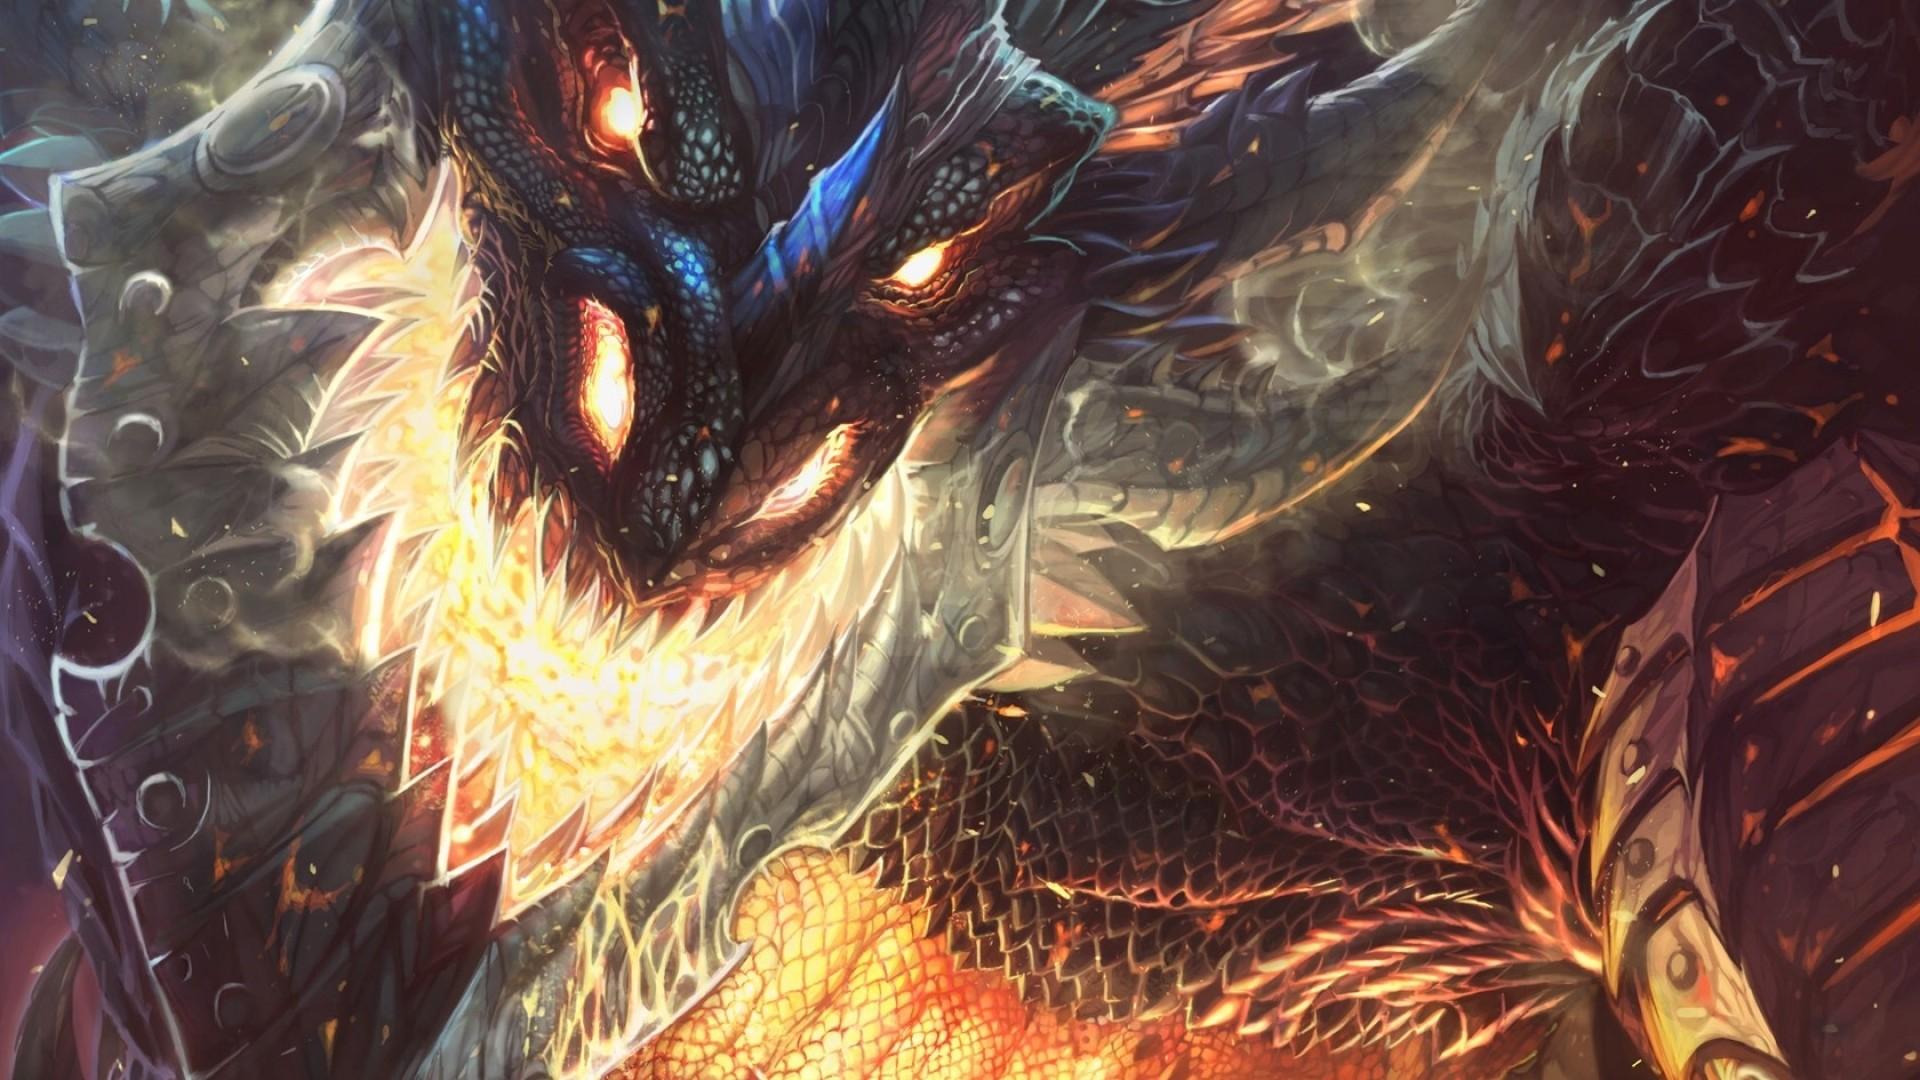 Fire Dragon Wallpaper (67+ images)